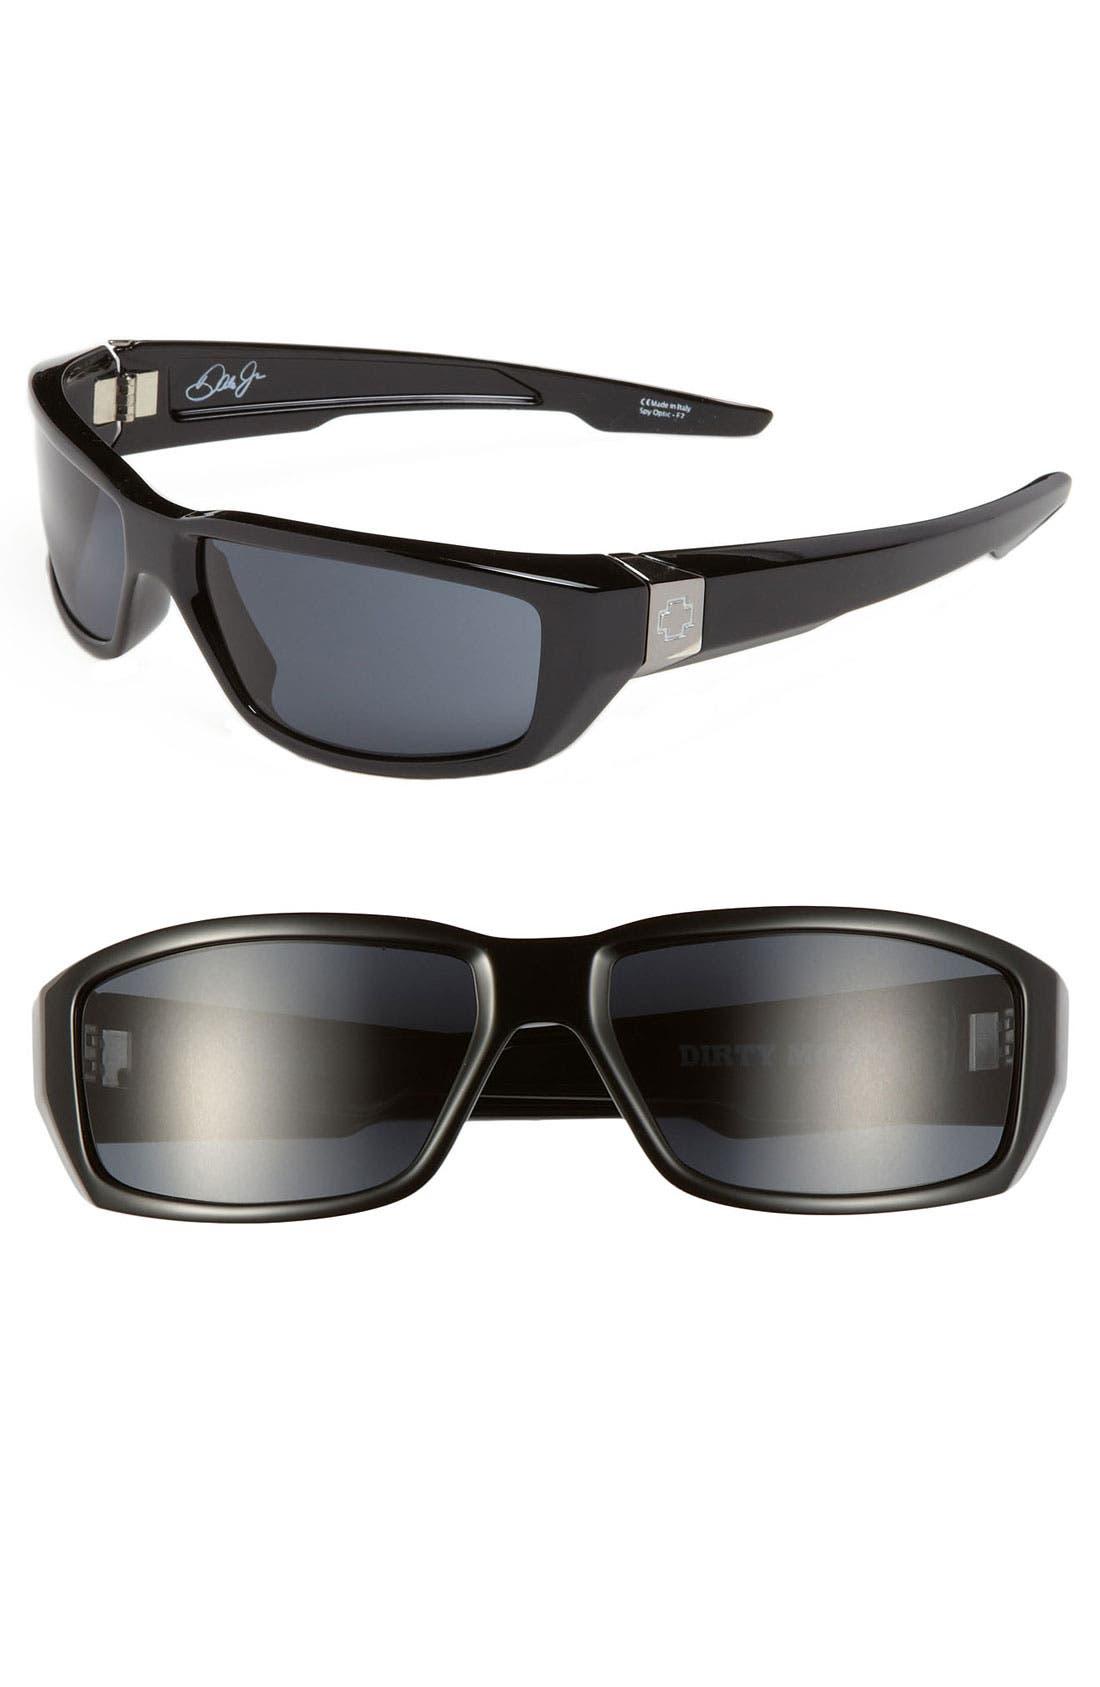 Alternate Image 1 Selected - SPY Optic 'Dale Earnhardt Jr. - Dirty Mo' 59mm Sunglasses